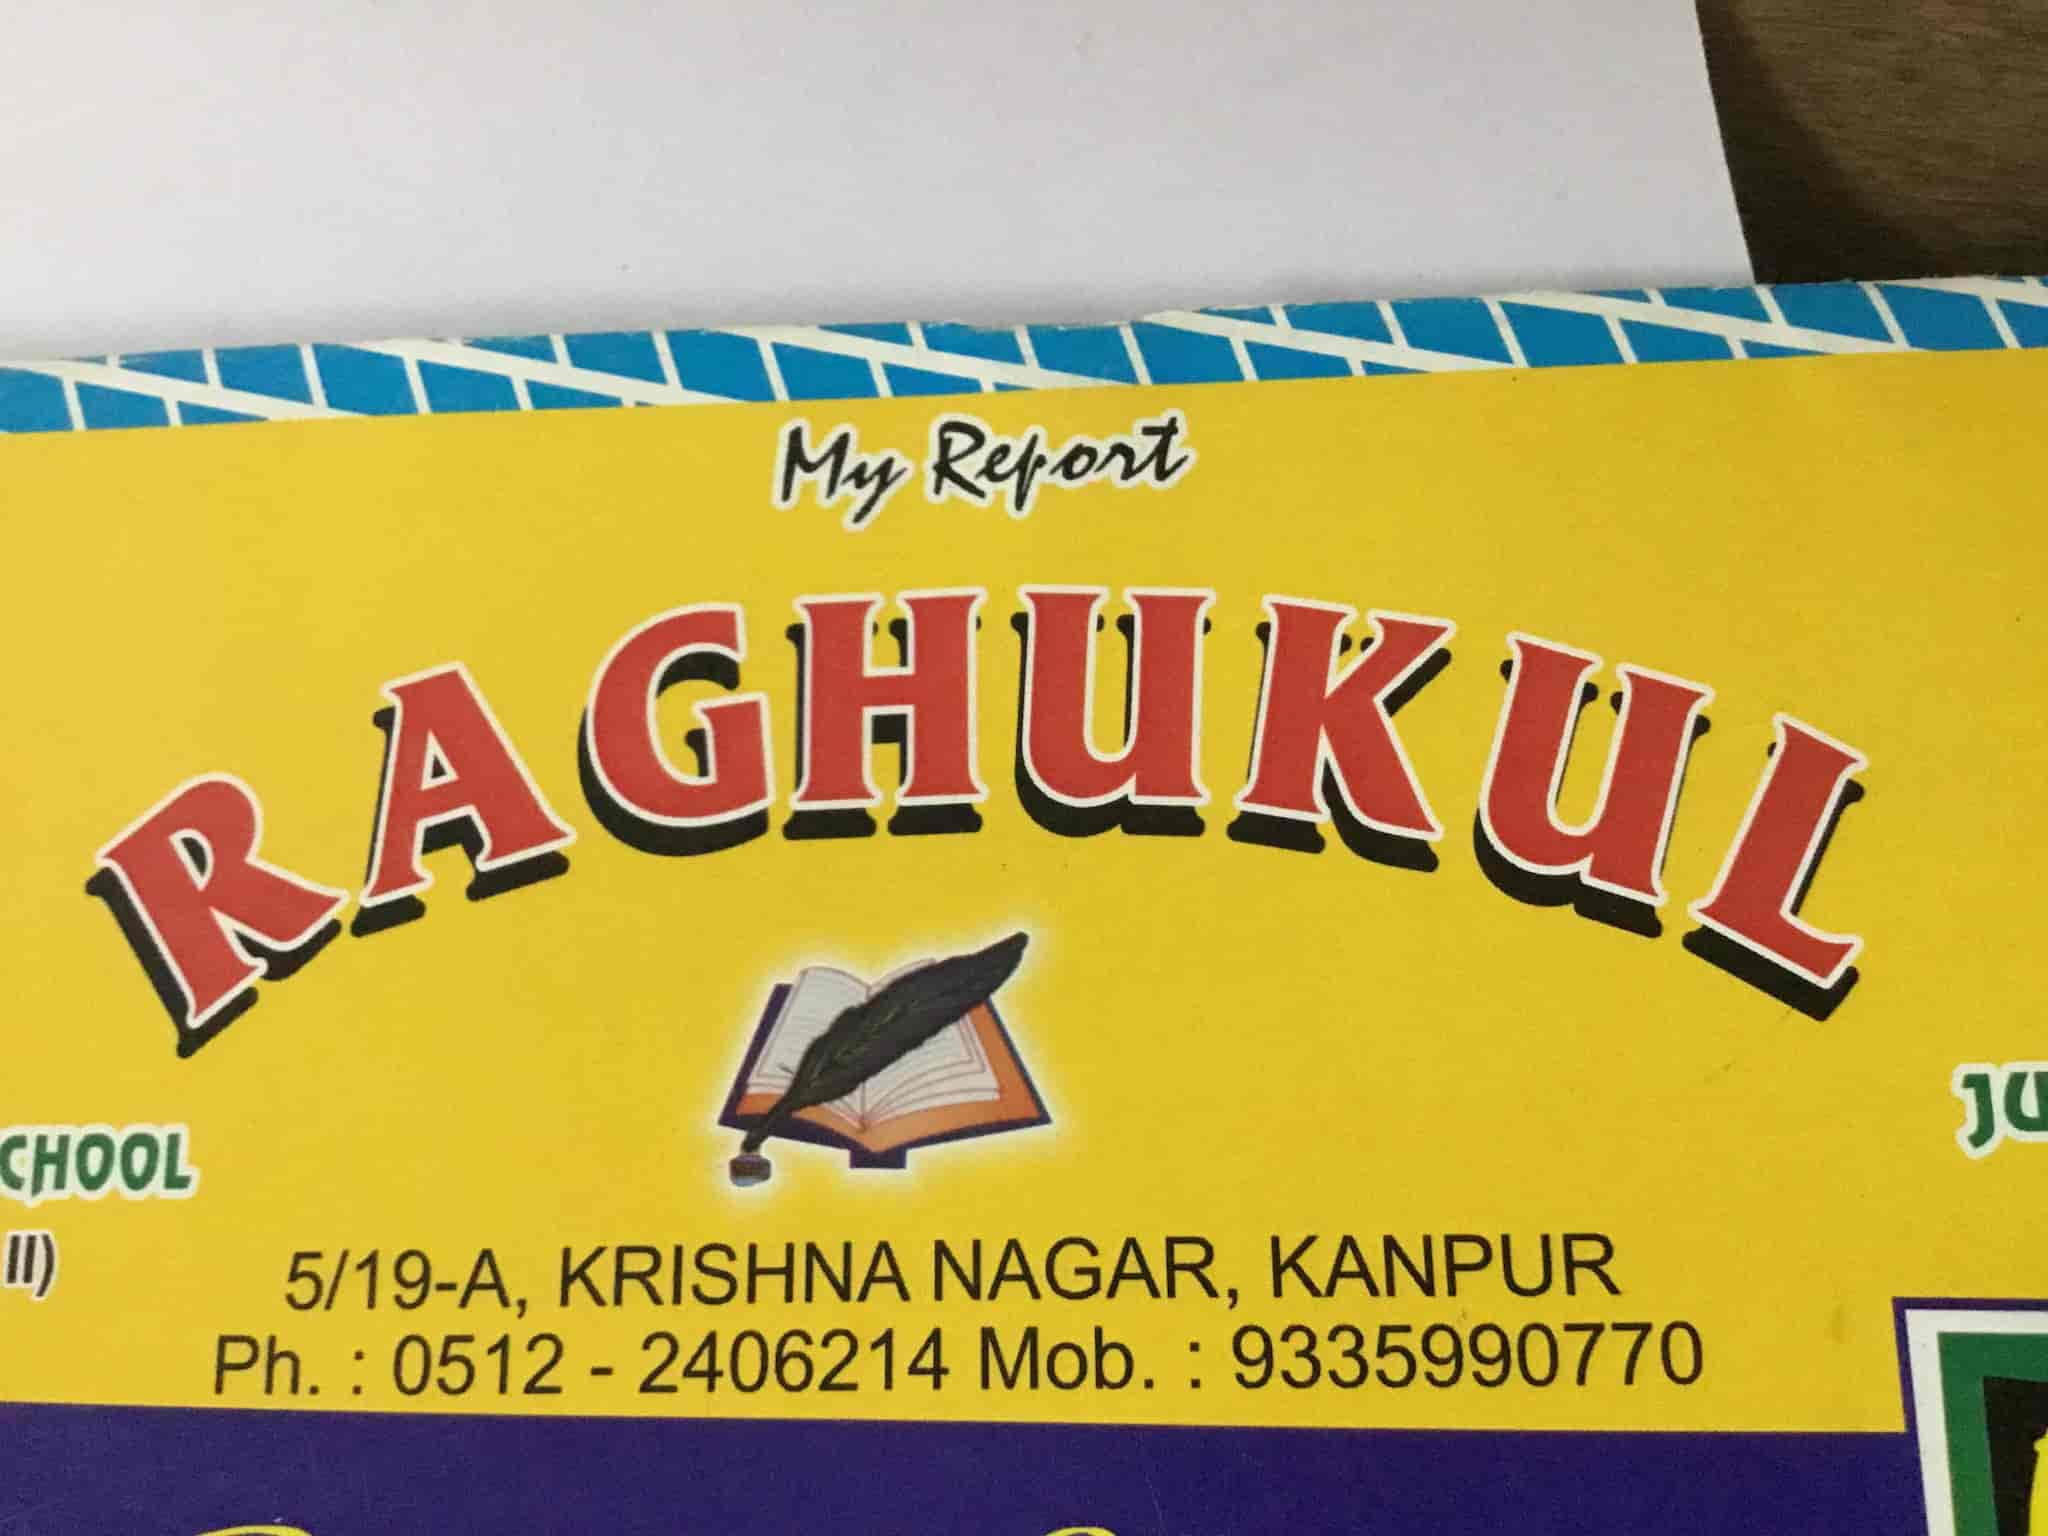 Raghukul School Krishna Nagar Schools In Kanpur Justdial Displaying 19gt Images For Johnny 5 Is Alive